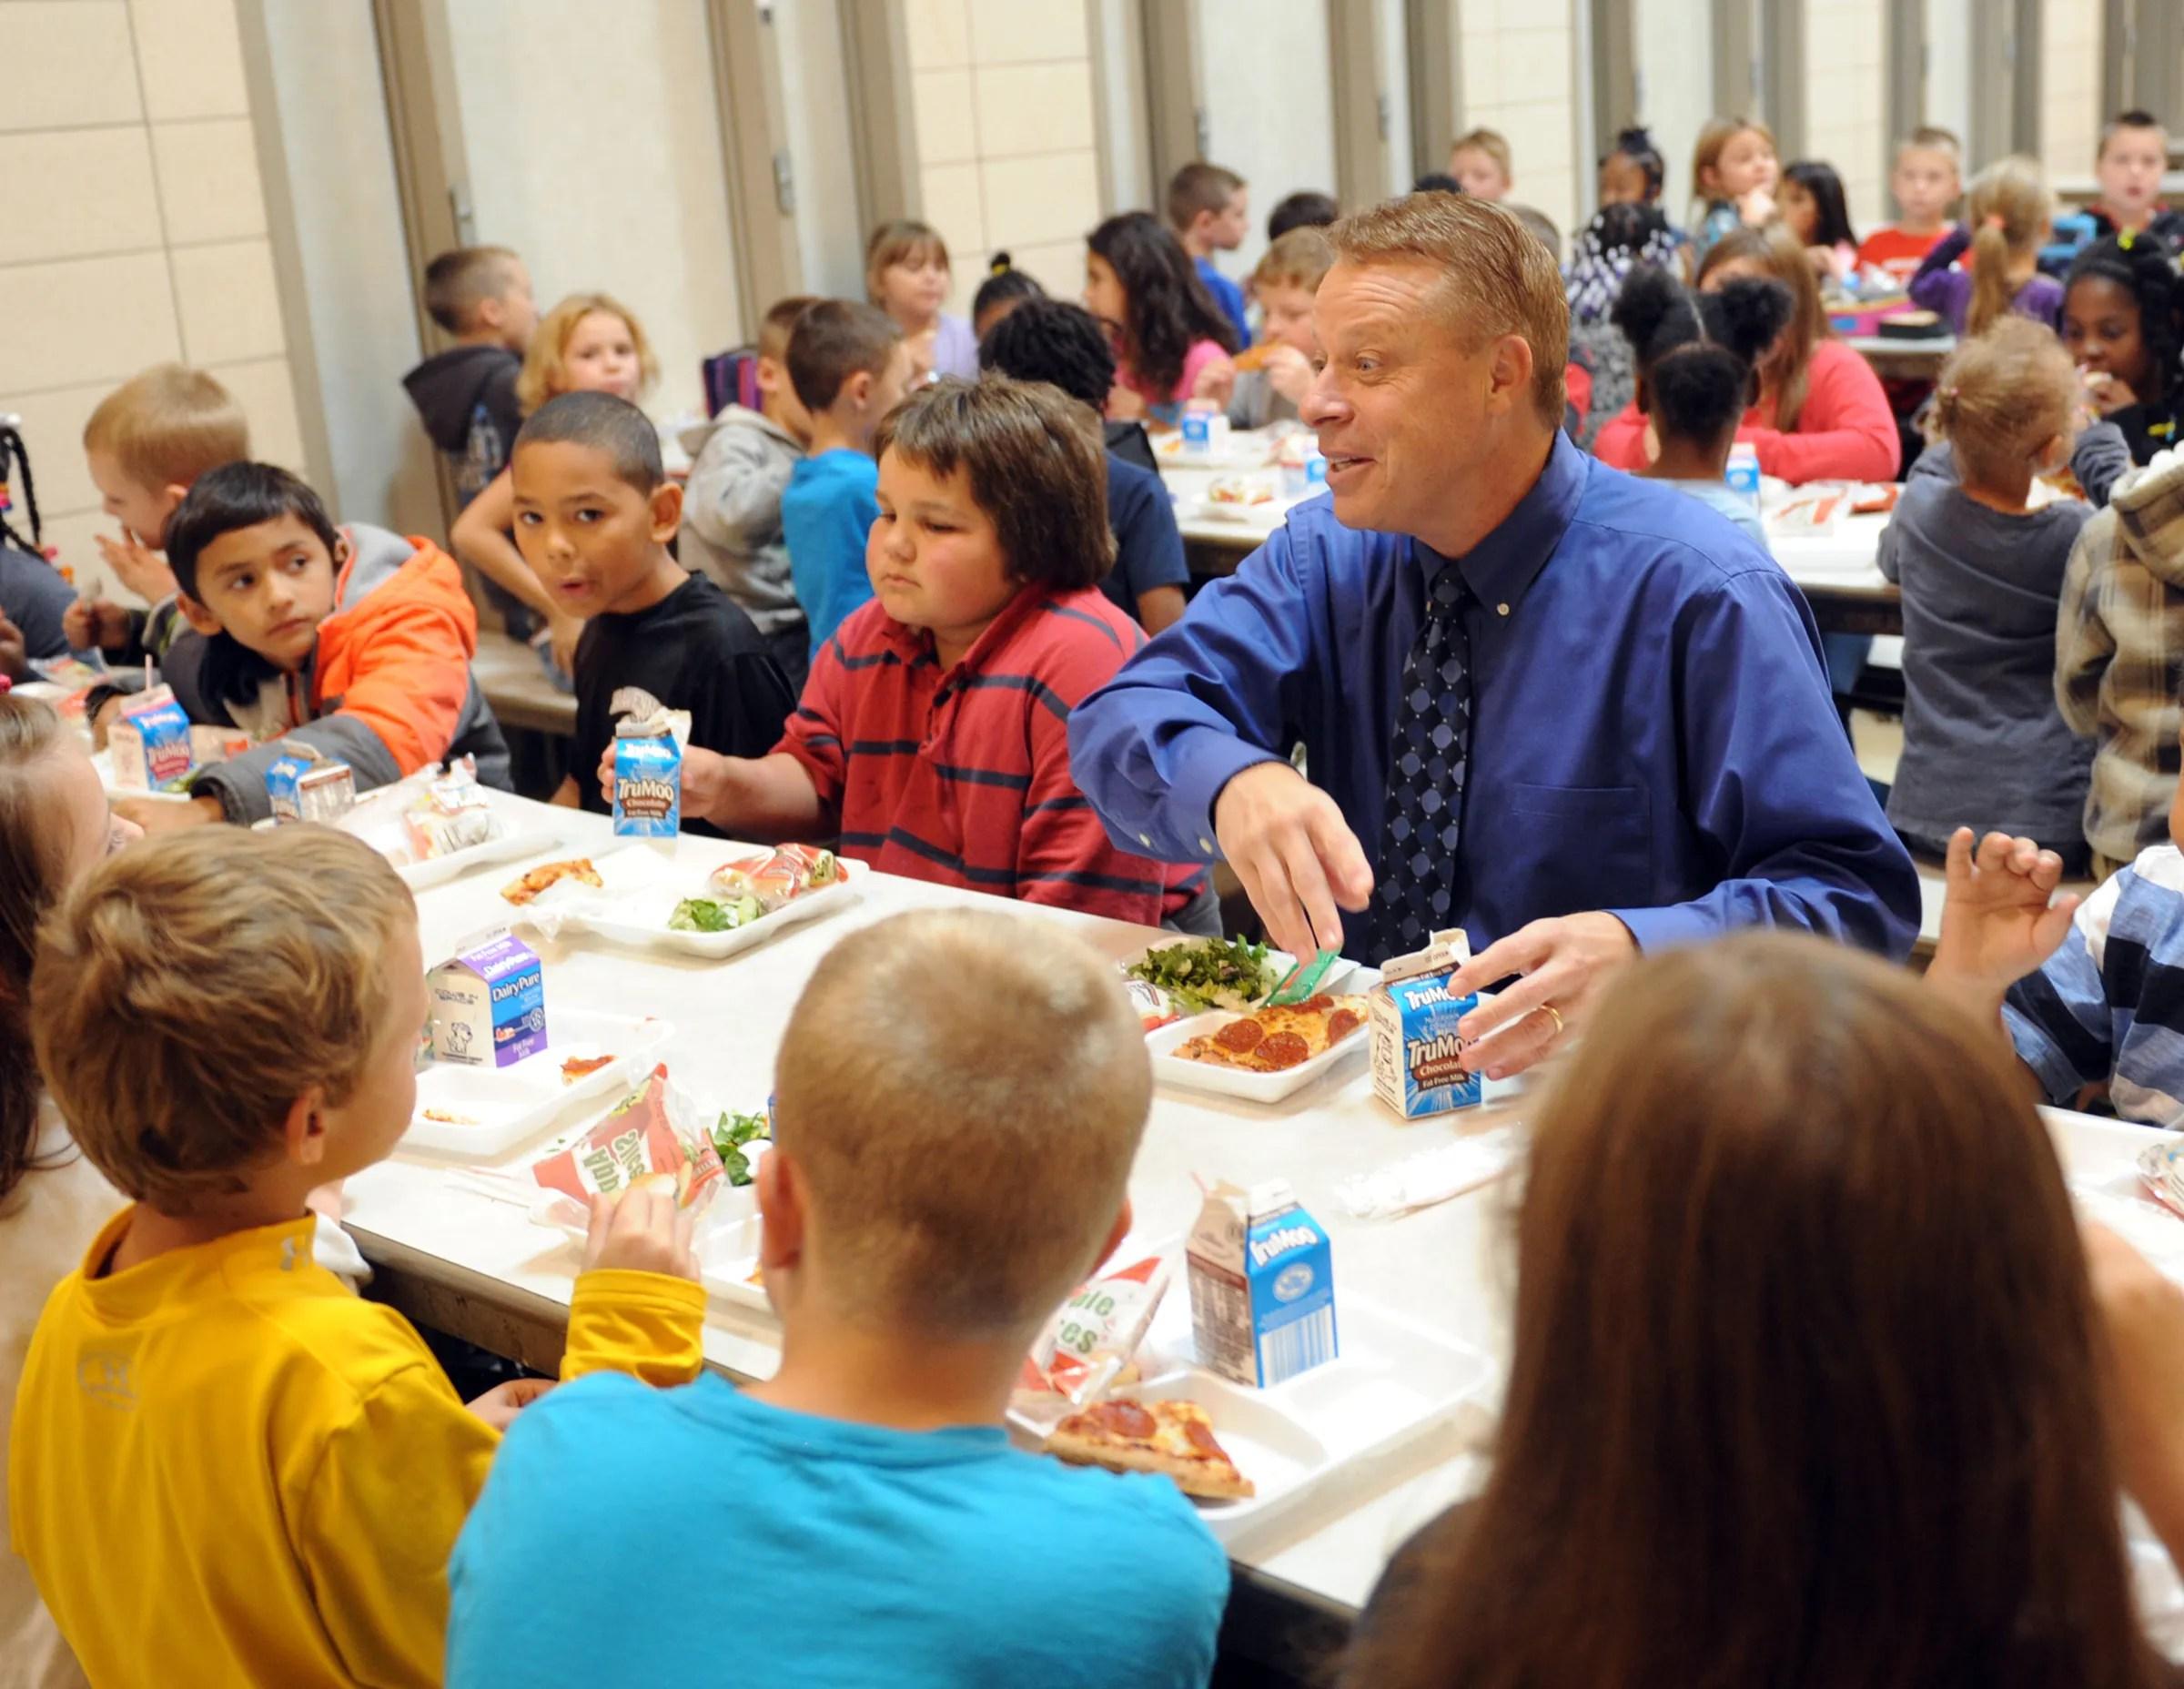 Seven on short list for Ravenna superintendent including Ravenna, Streetsboro principals